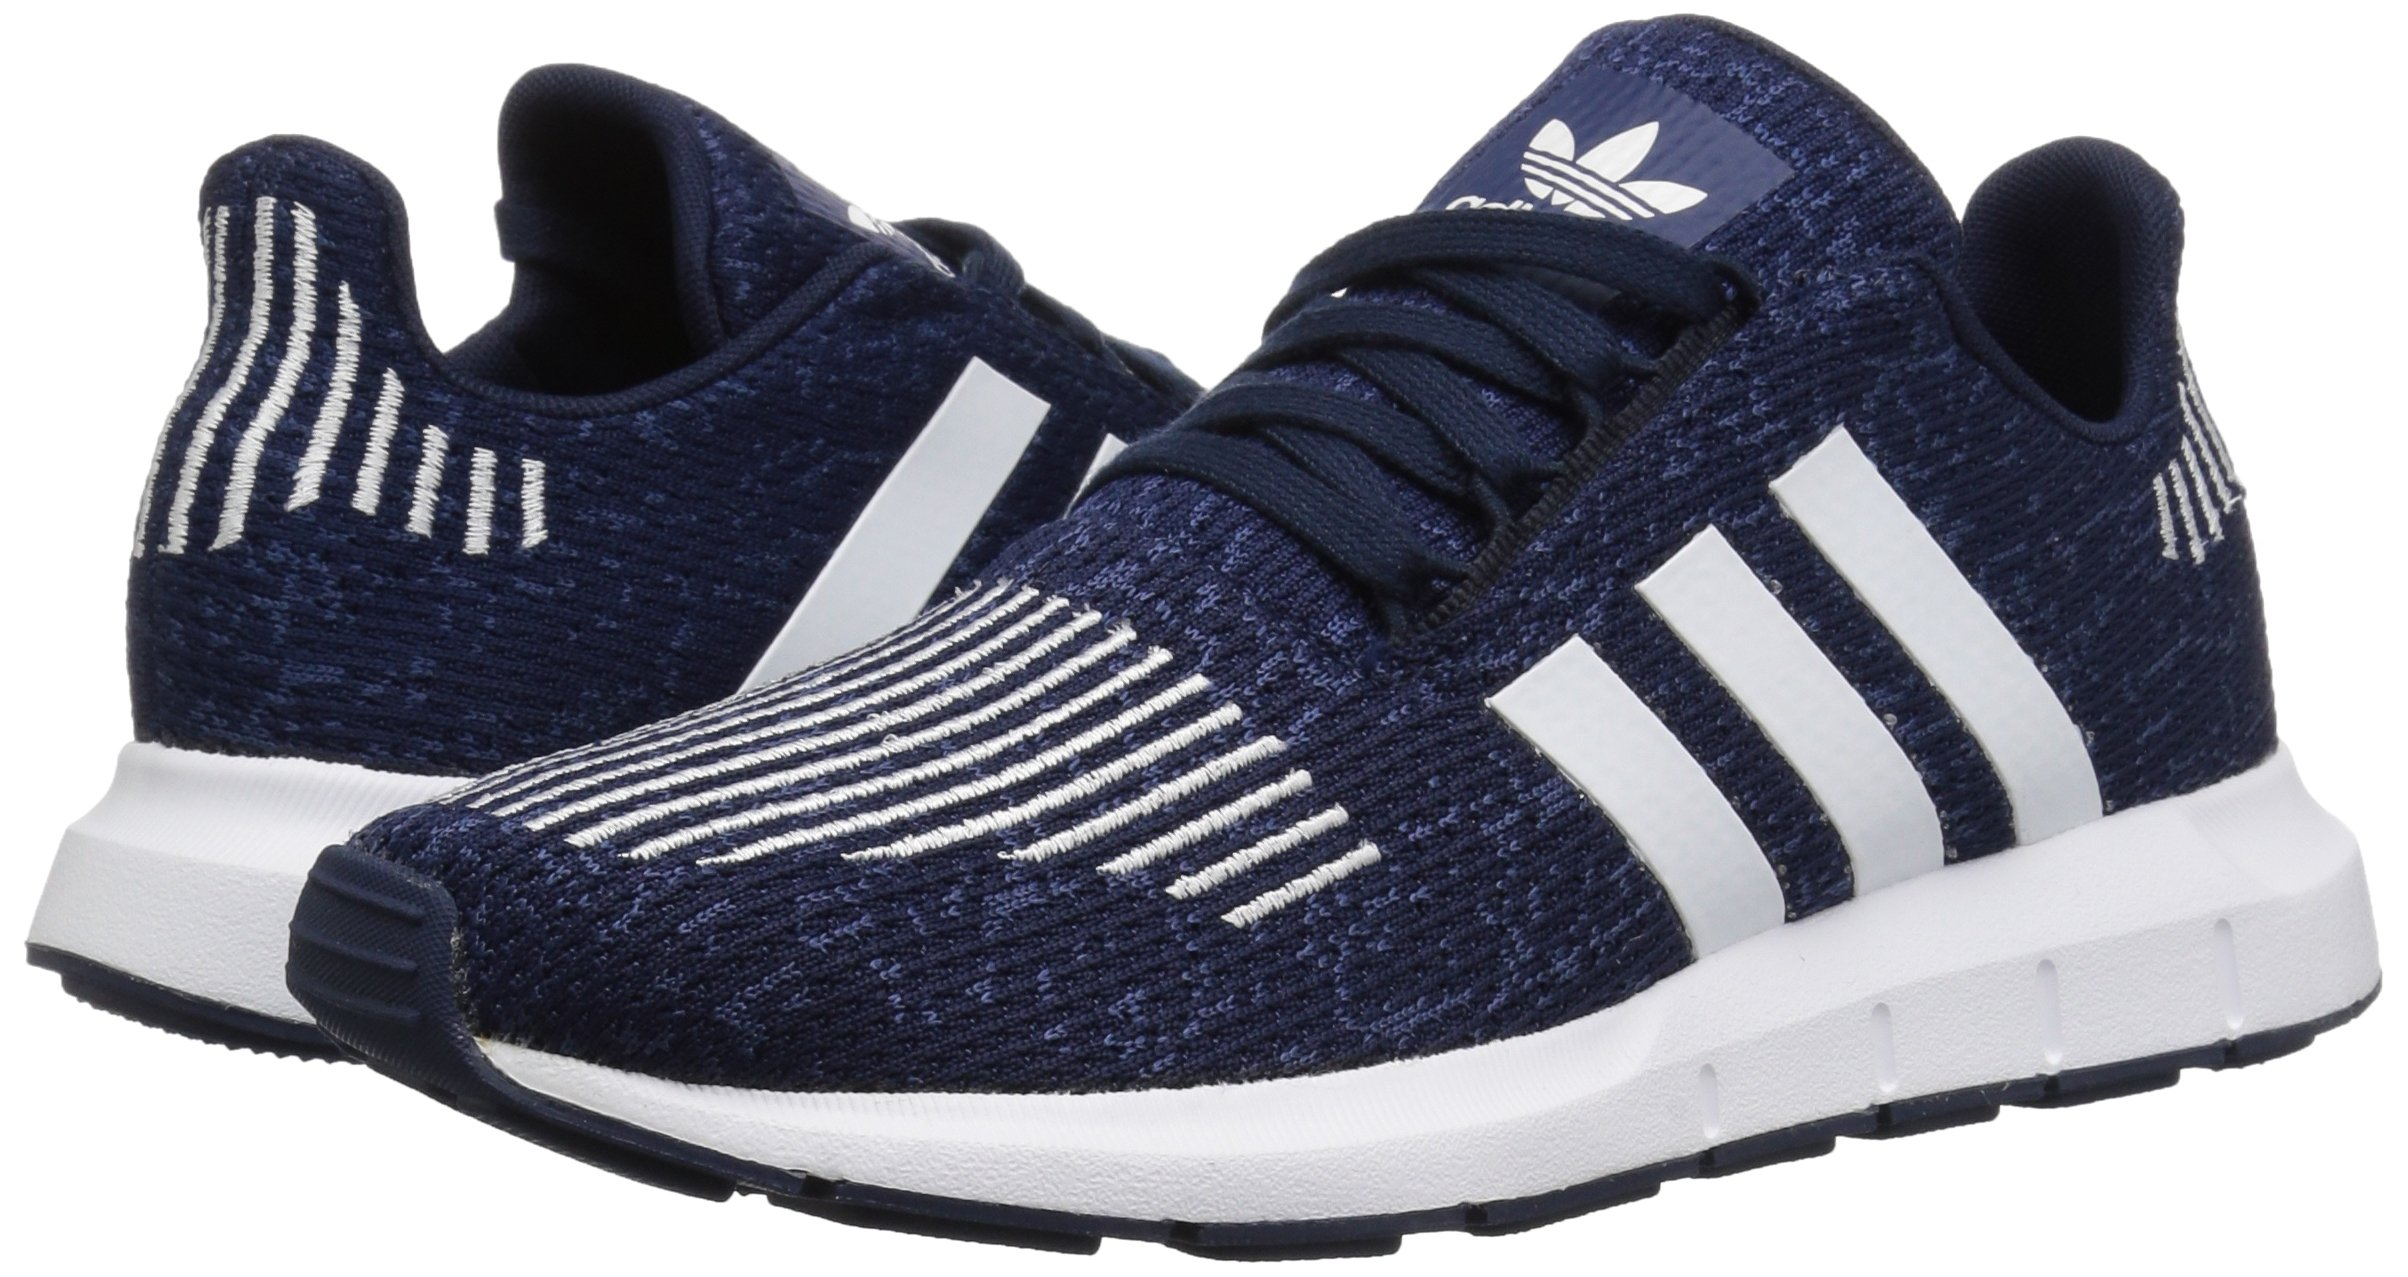 adidas Originals Baby Swift Running Shoe, Collegiate Navy/White/Mystery Blue, 4K M US Toddler by adidas Originals (Image #5)